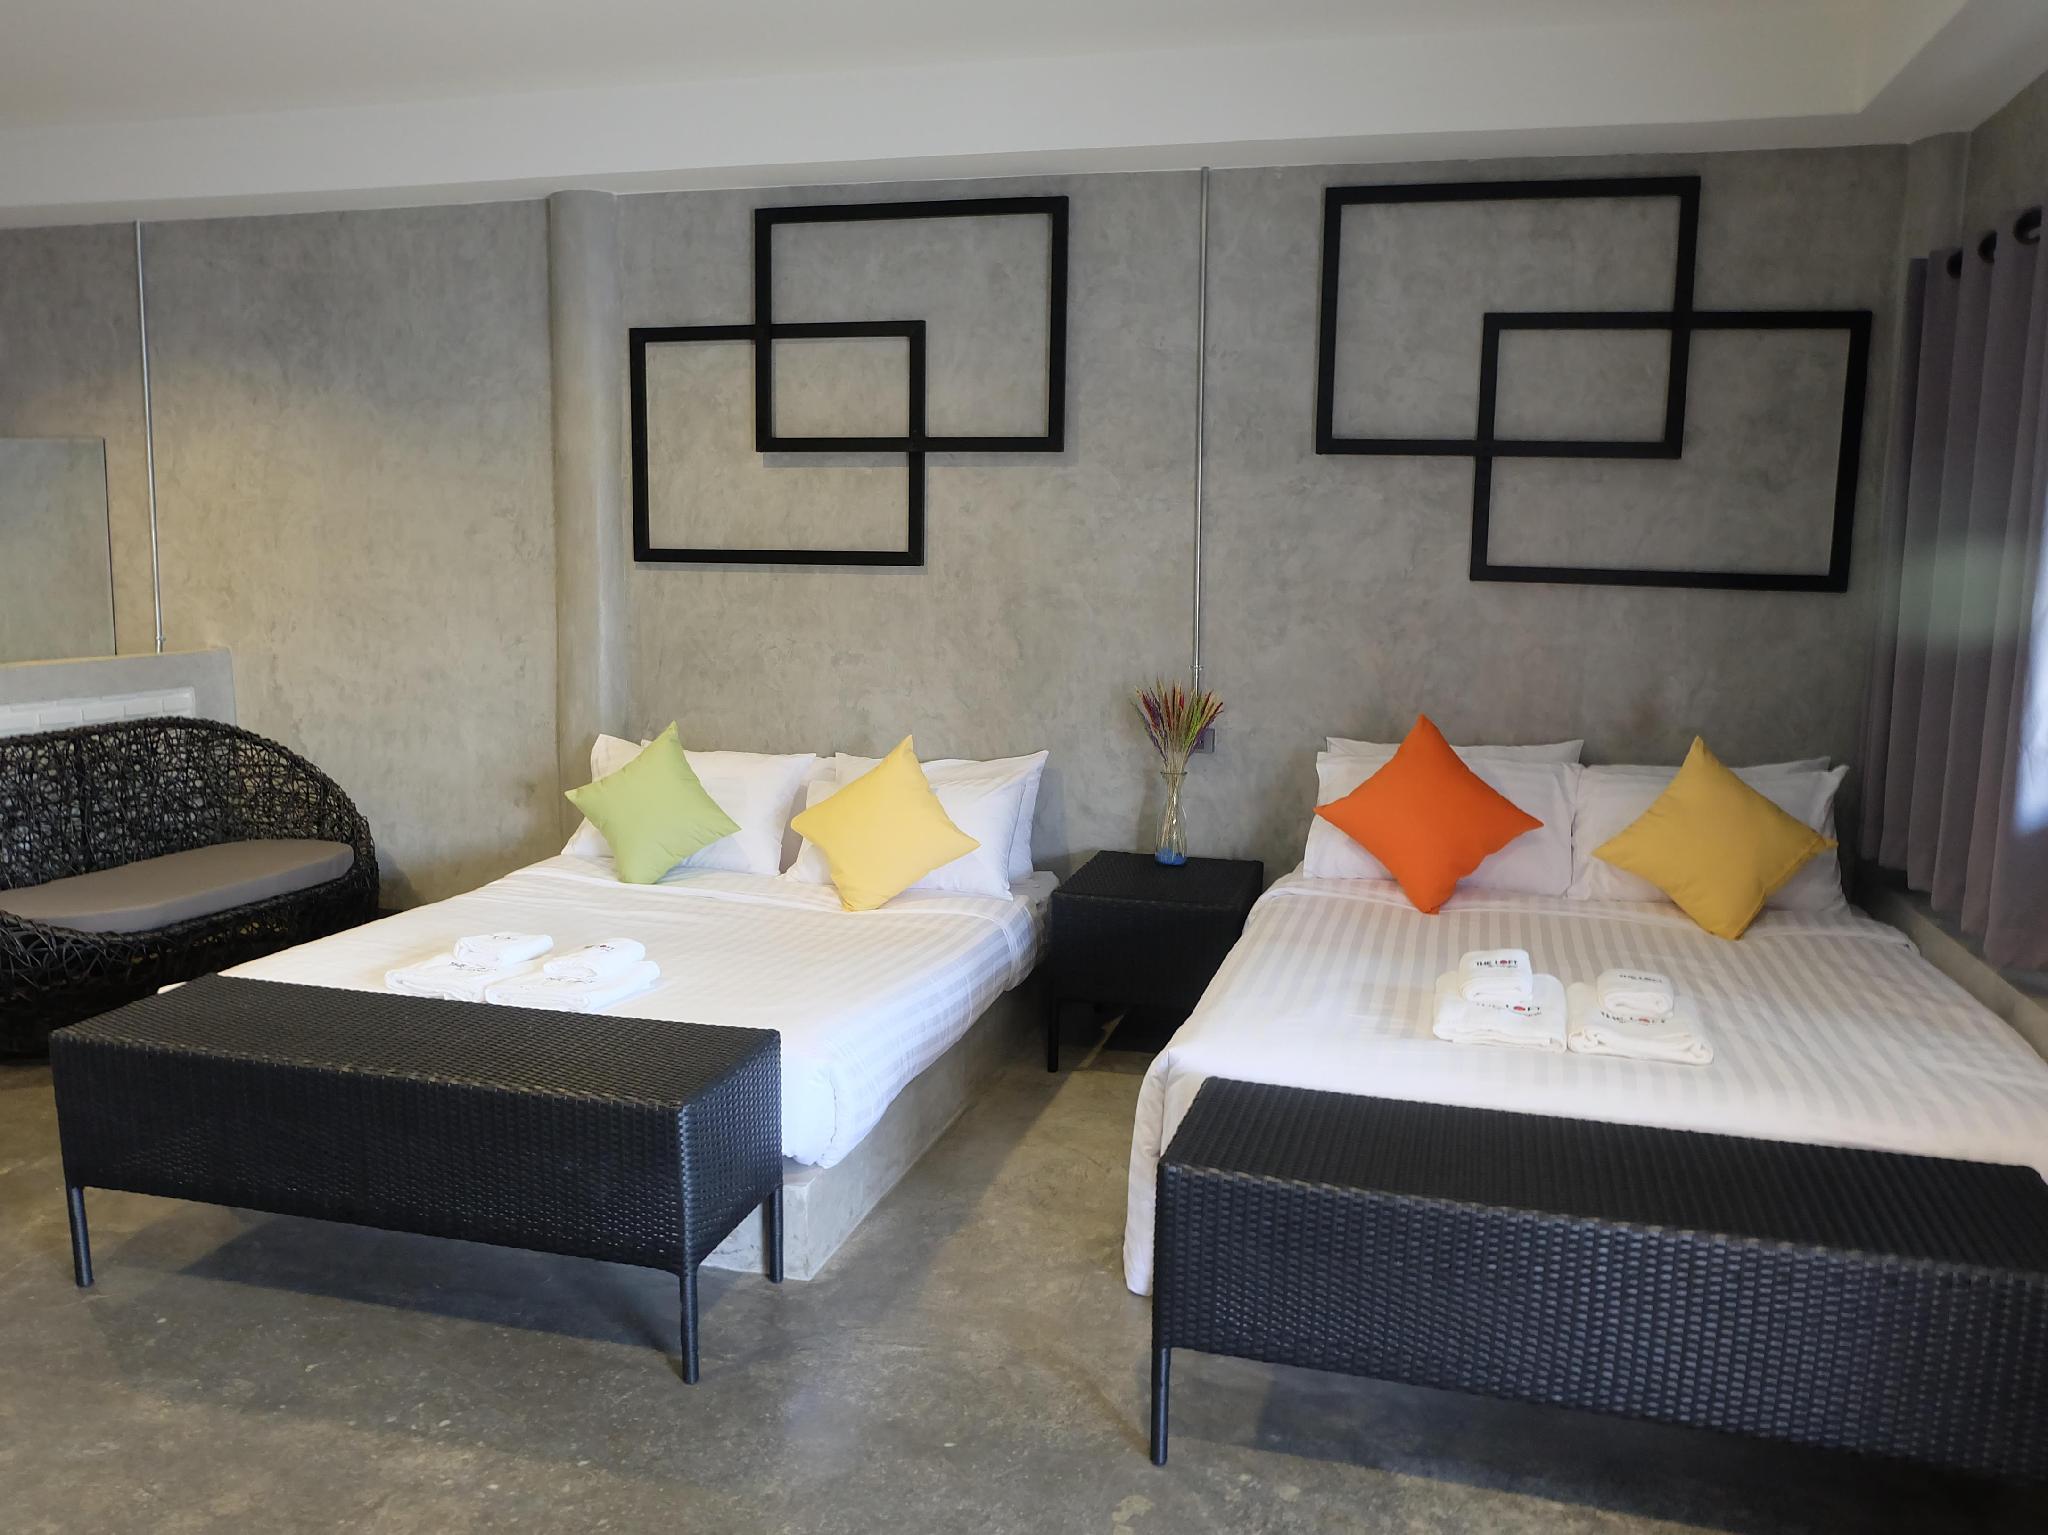 The Loft chiangrai - The Loft Chiangrai